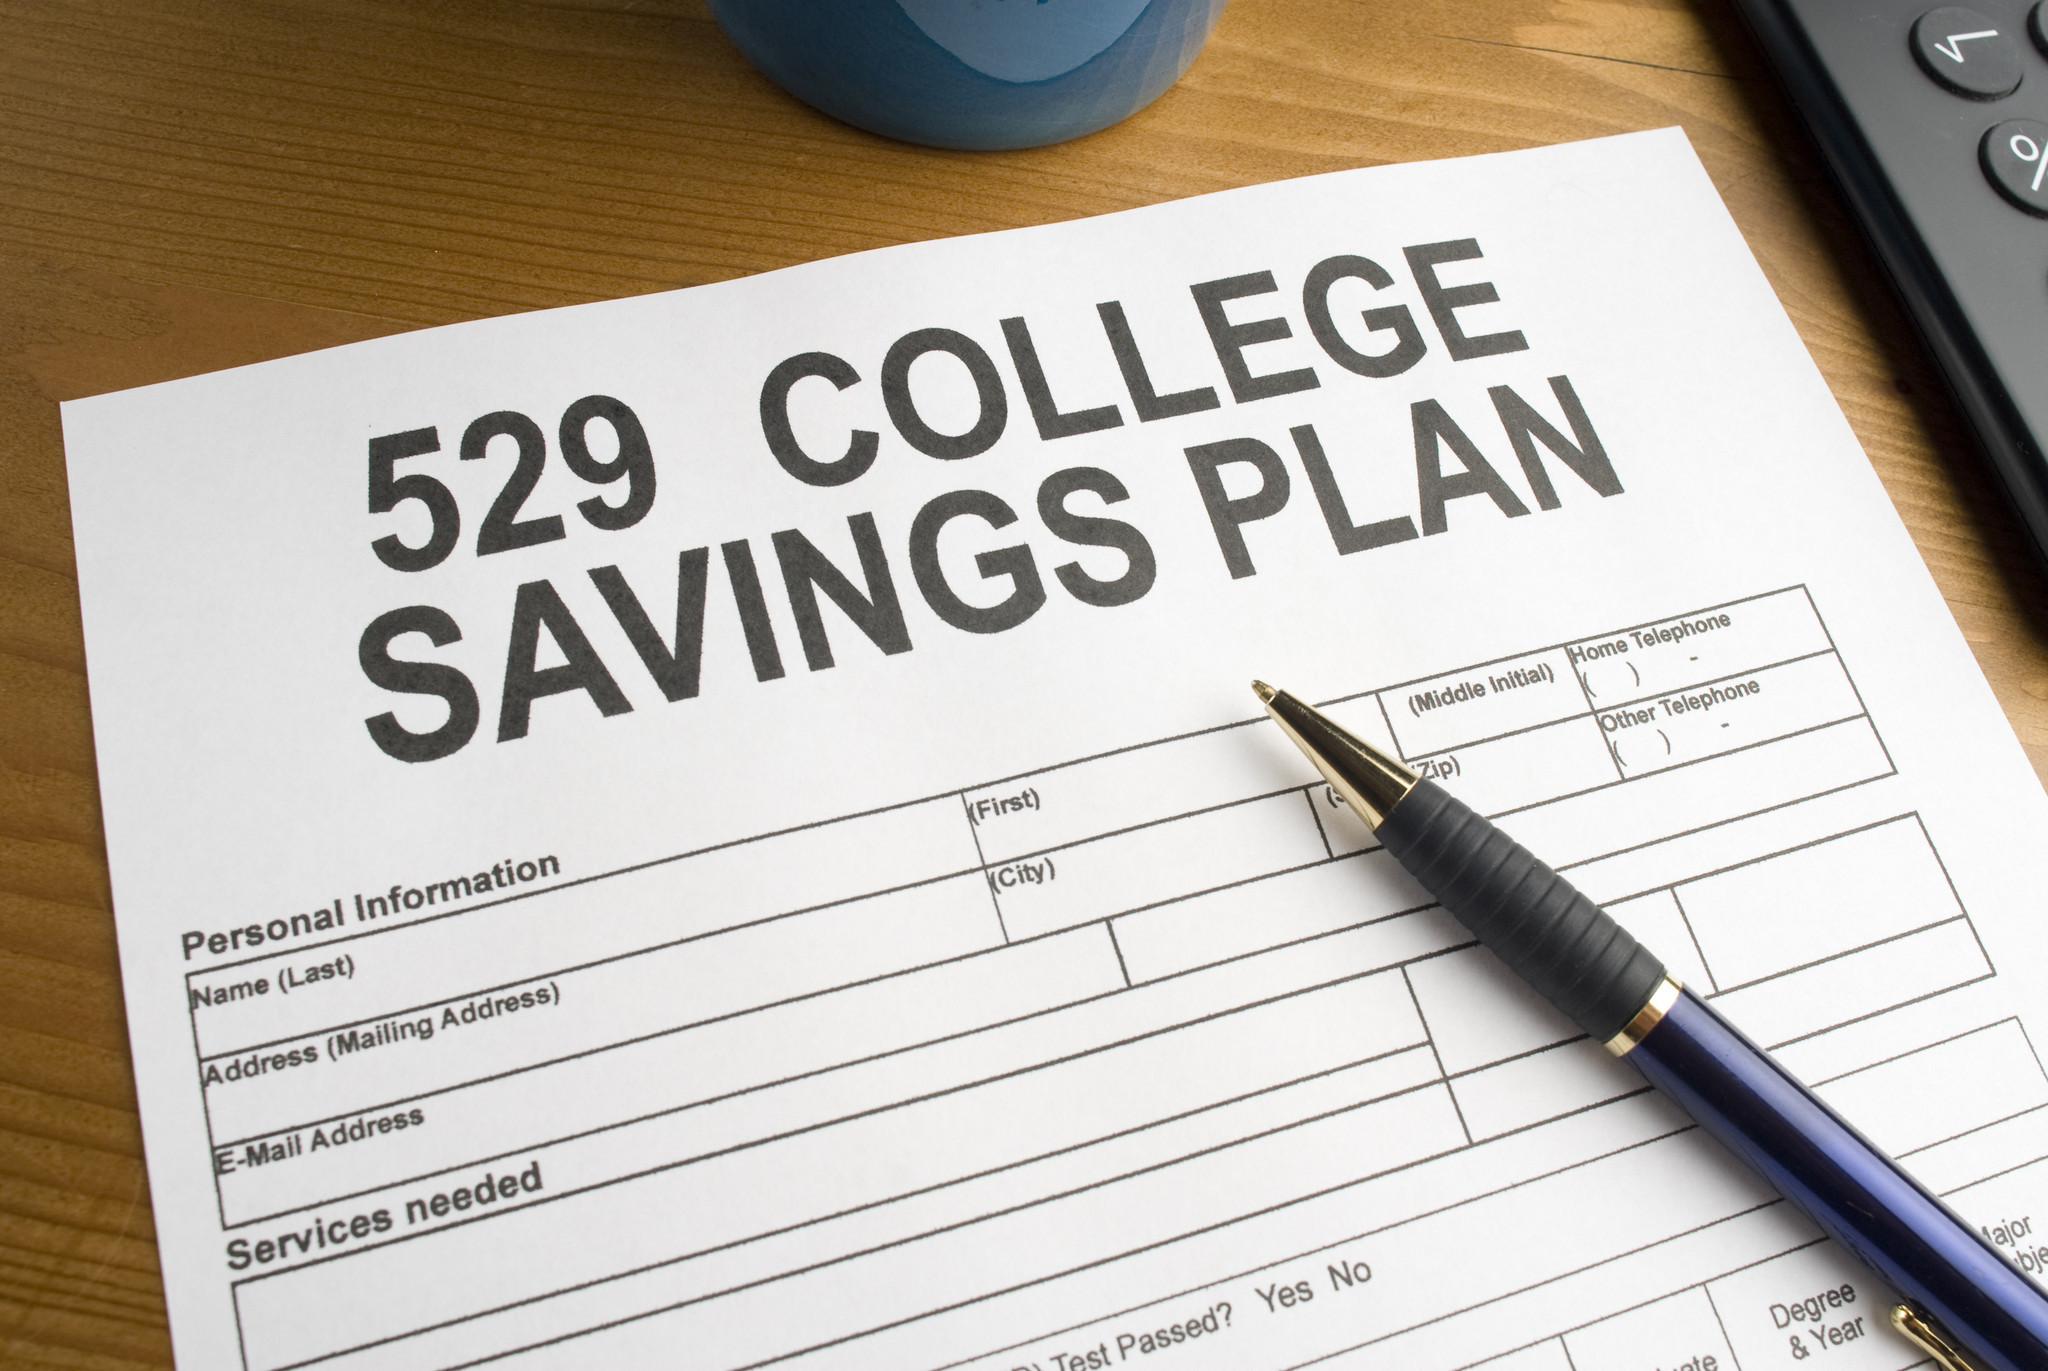 ct-college-savings-fees-1007-biz-20151006